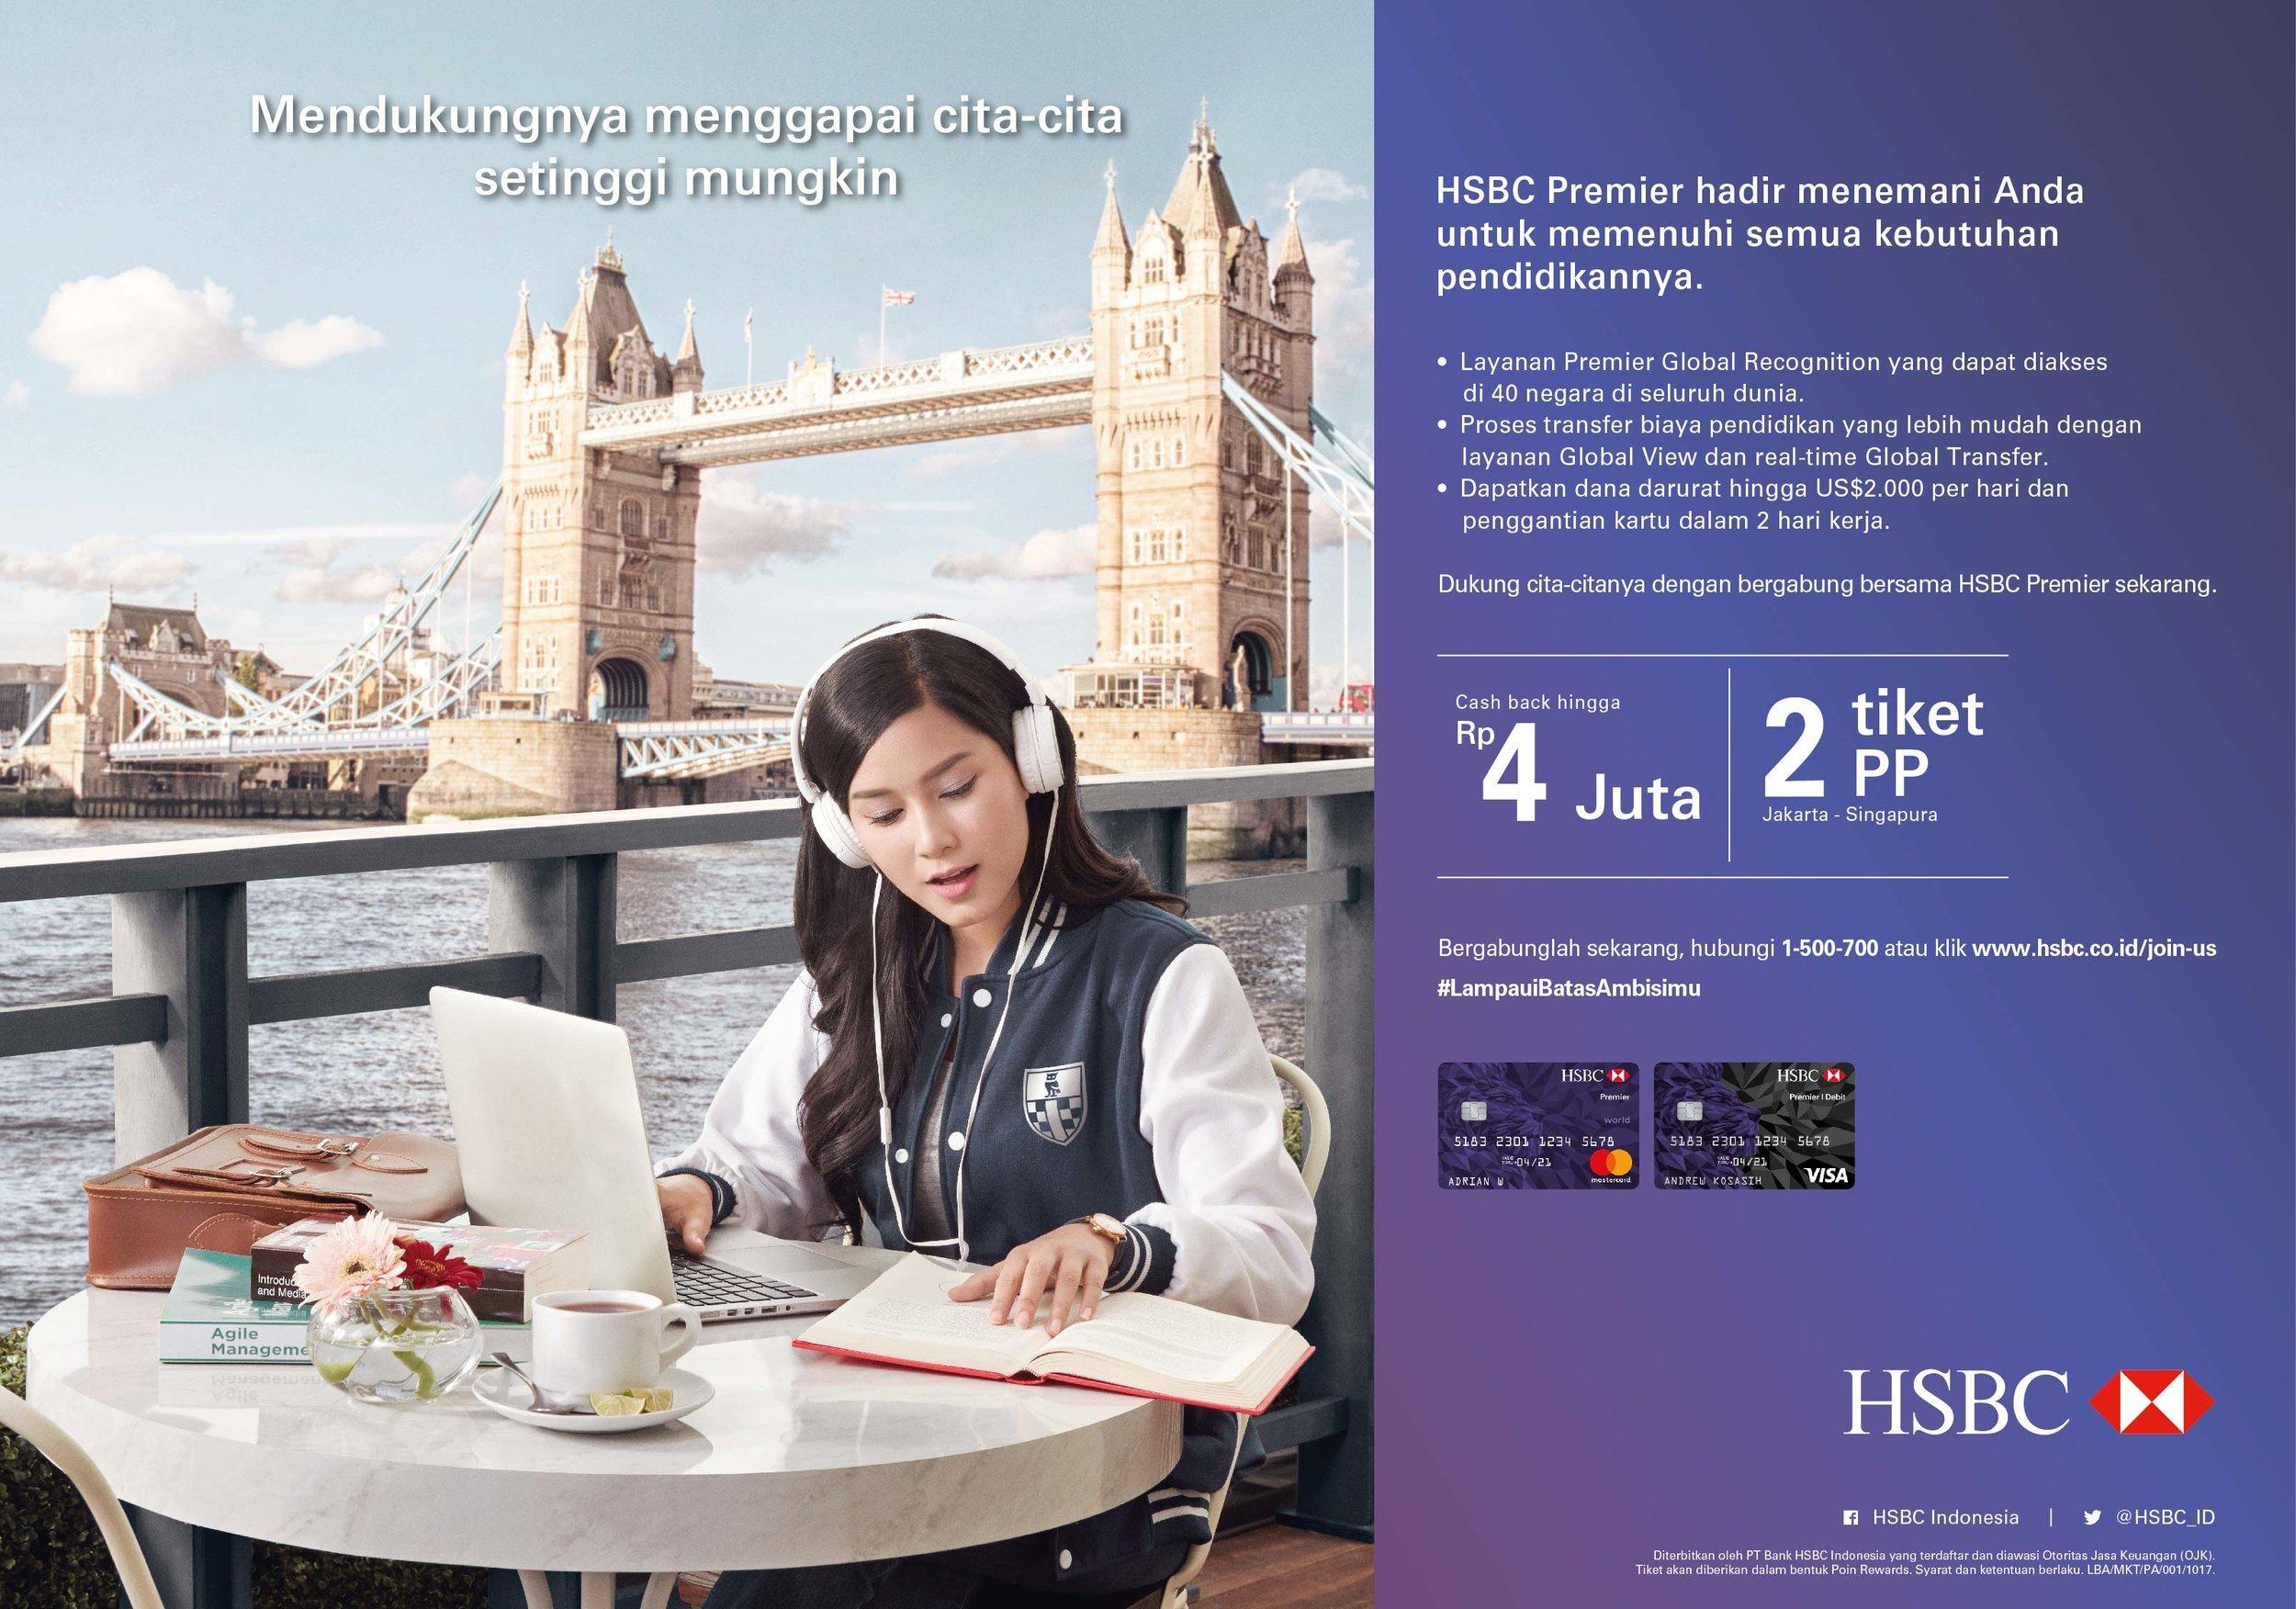 Bank HSBC Prev FA PrintAds Premier-Garuda 40.2x28cm 3-01.jpg